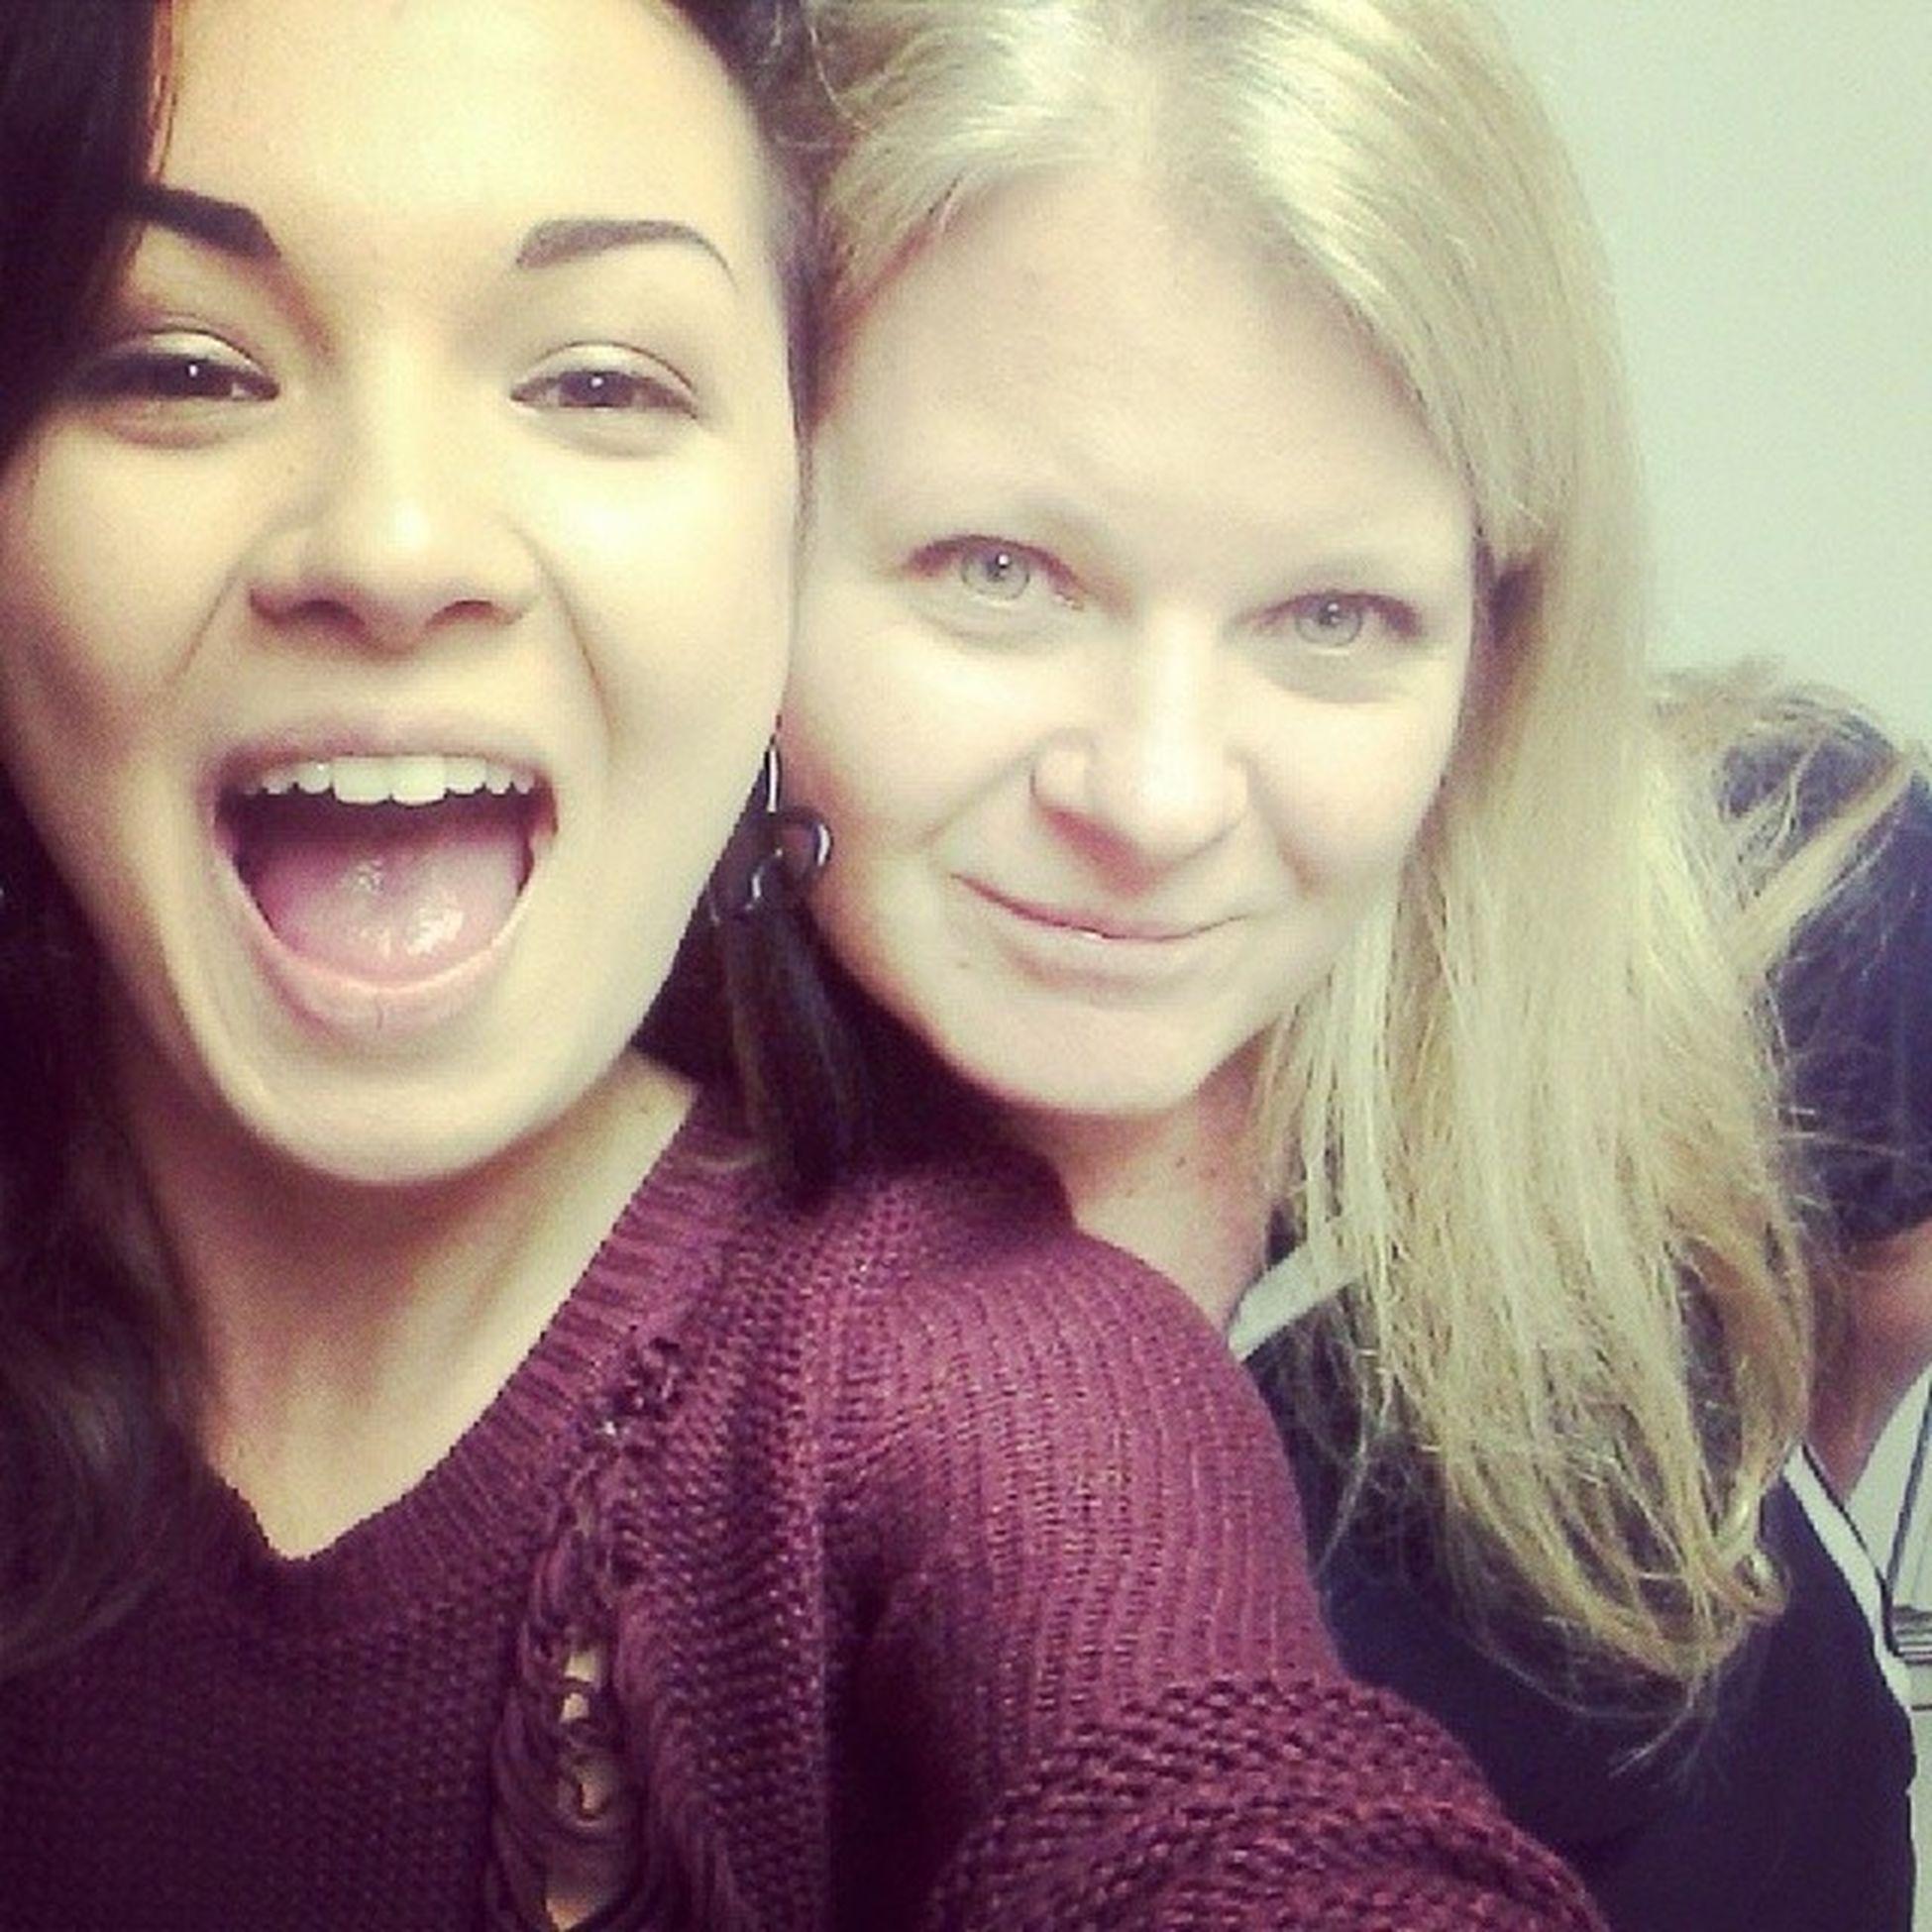 Selfie with my mommy Merrychrisrmas Selfie Mommy